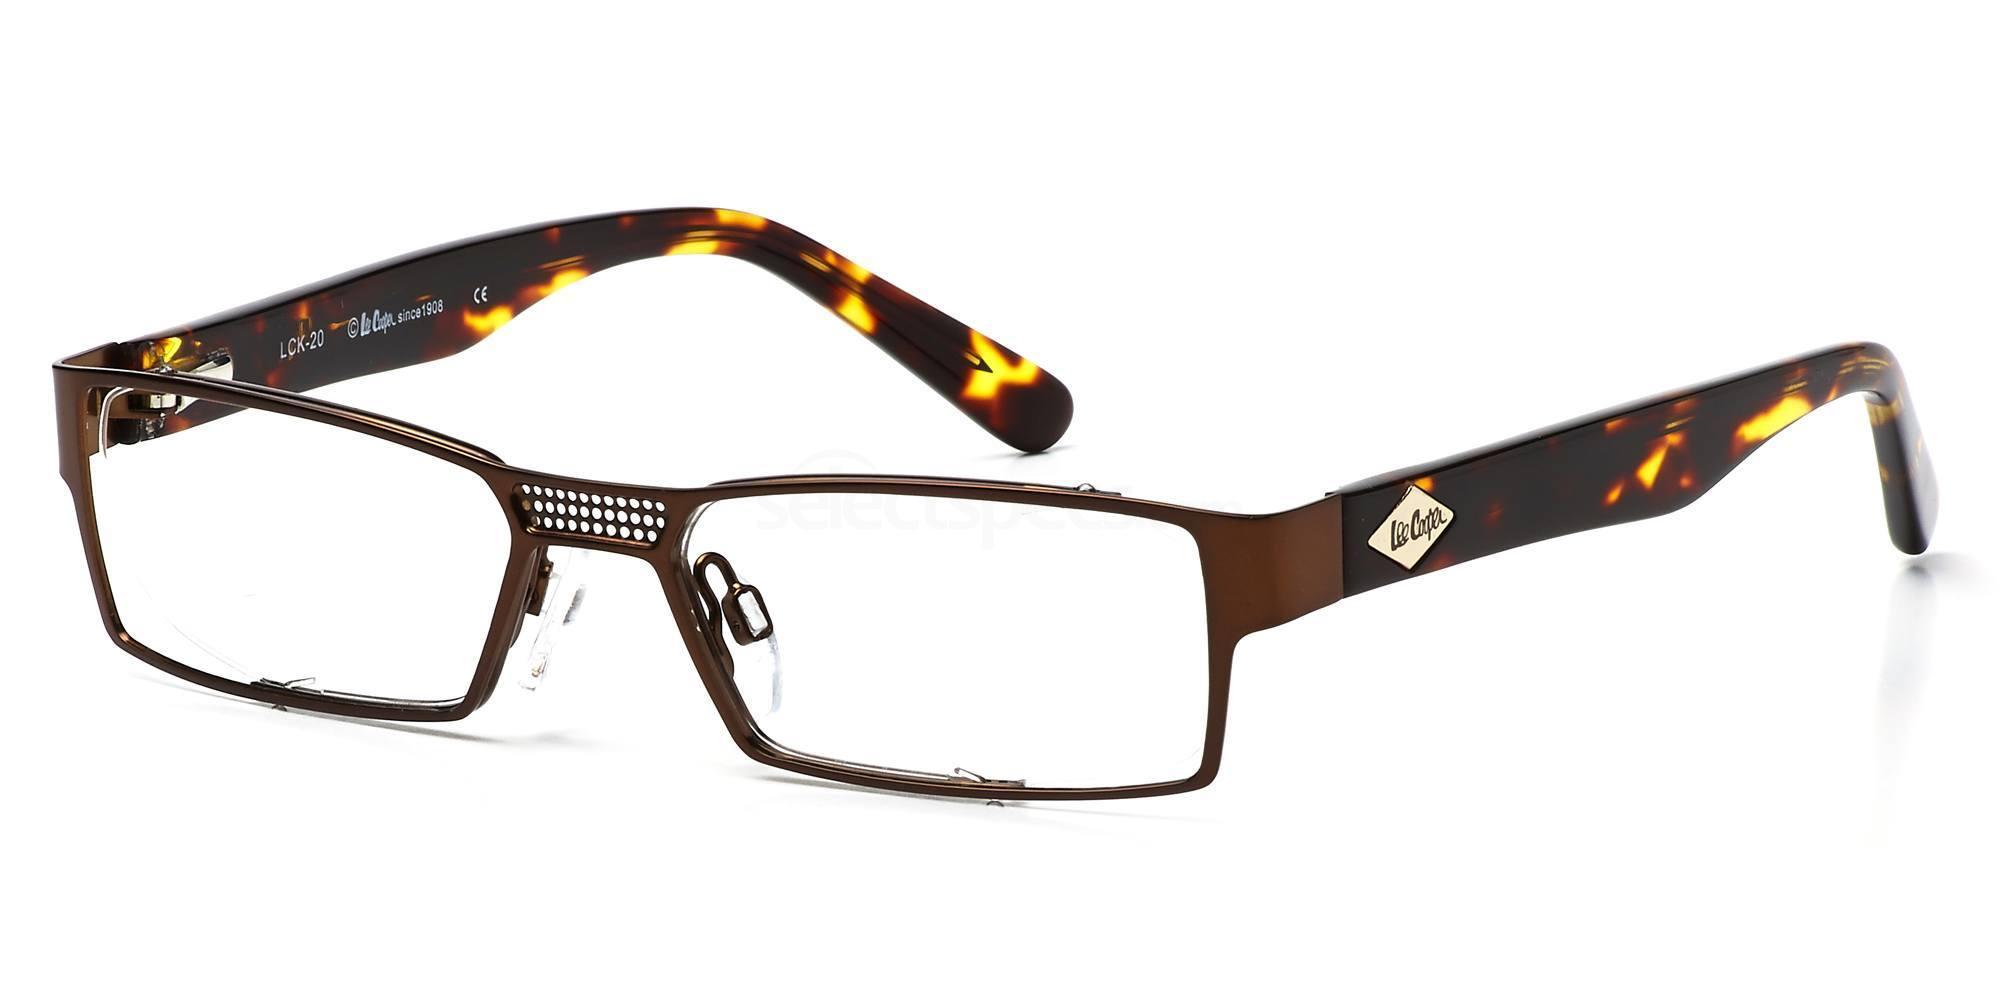 C2 LCK20 Glasses, Lee Cooper KIDS